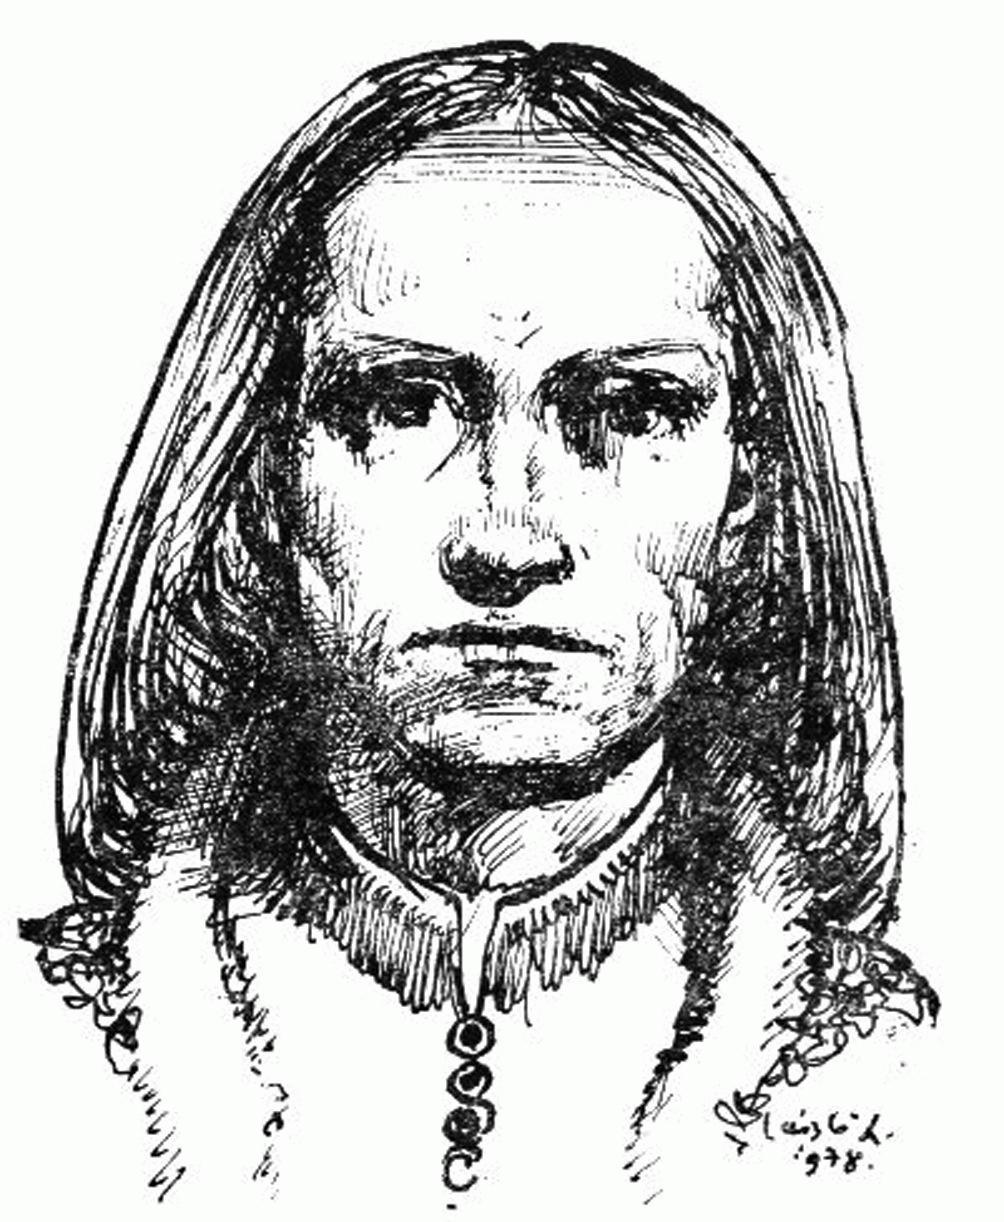 Dávid Ferenc